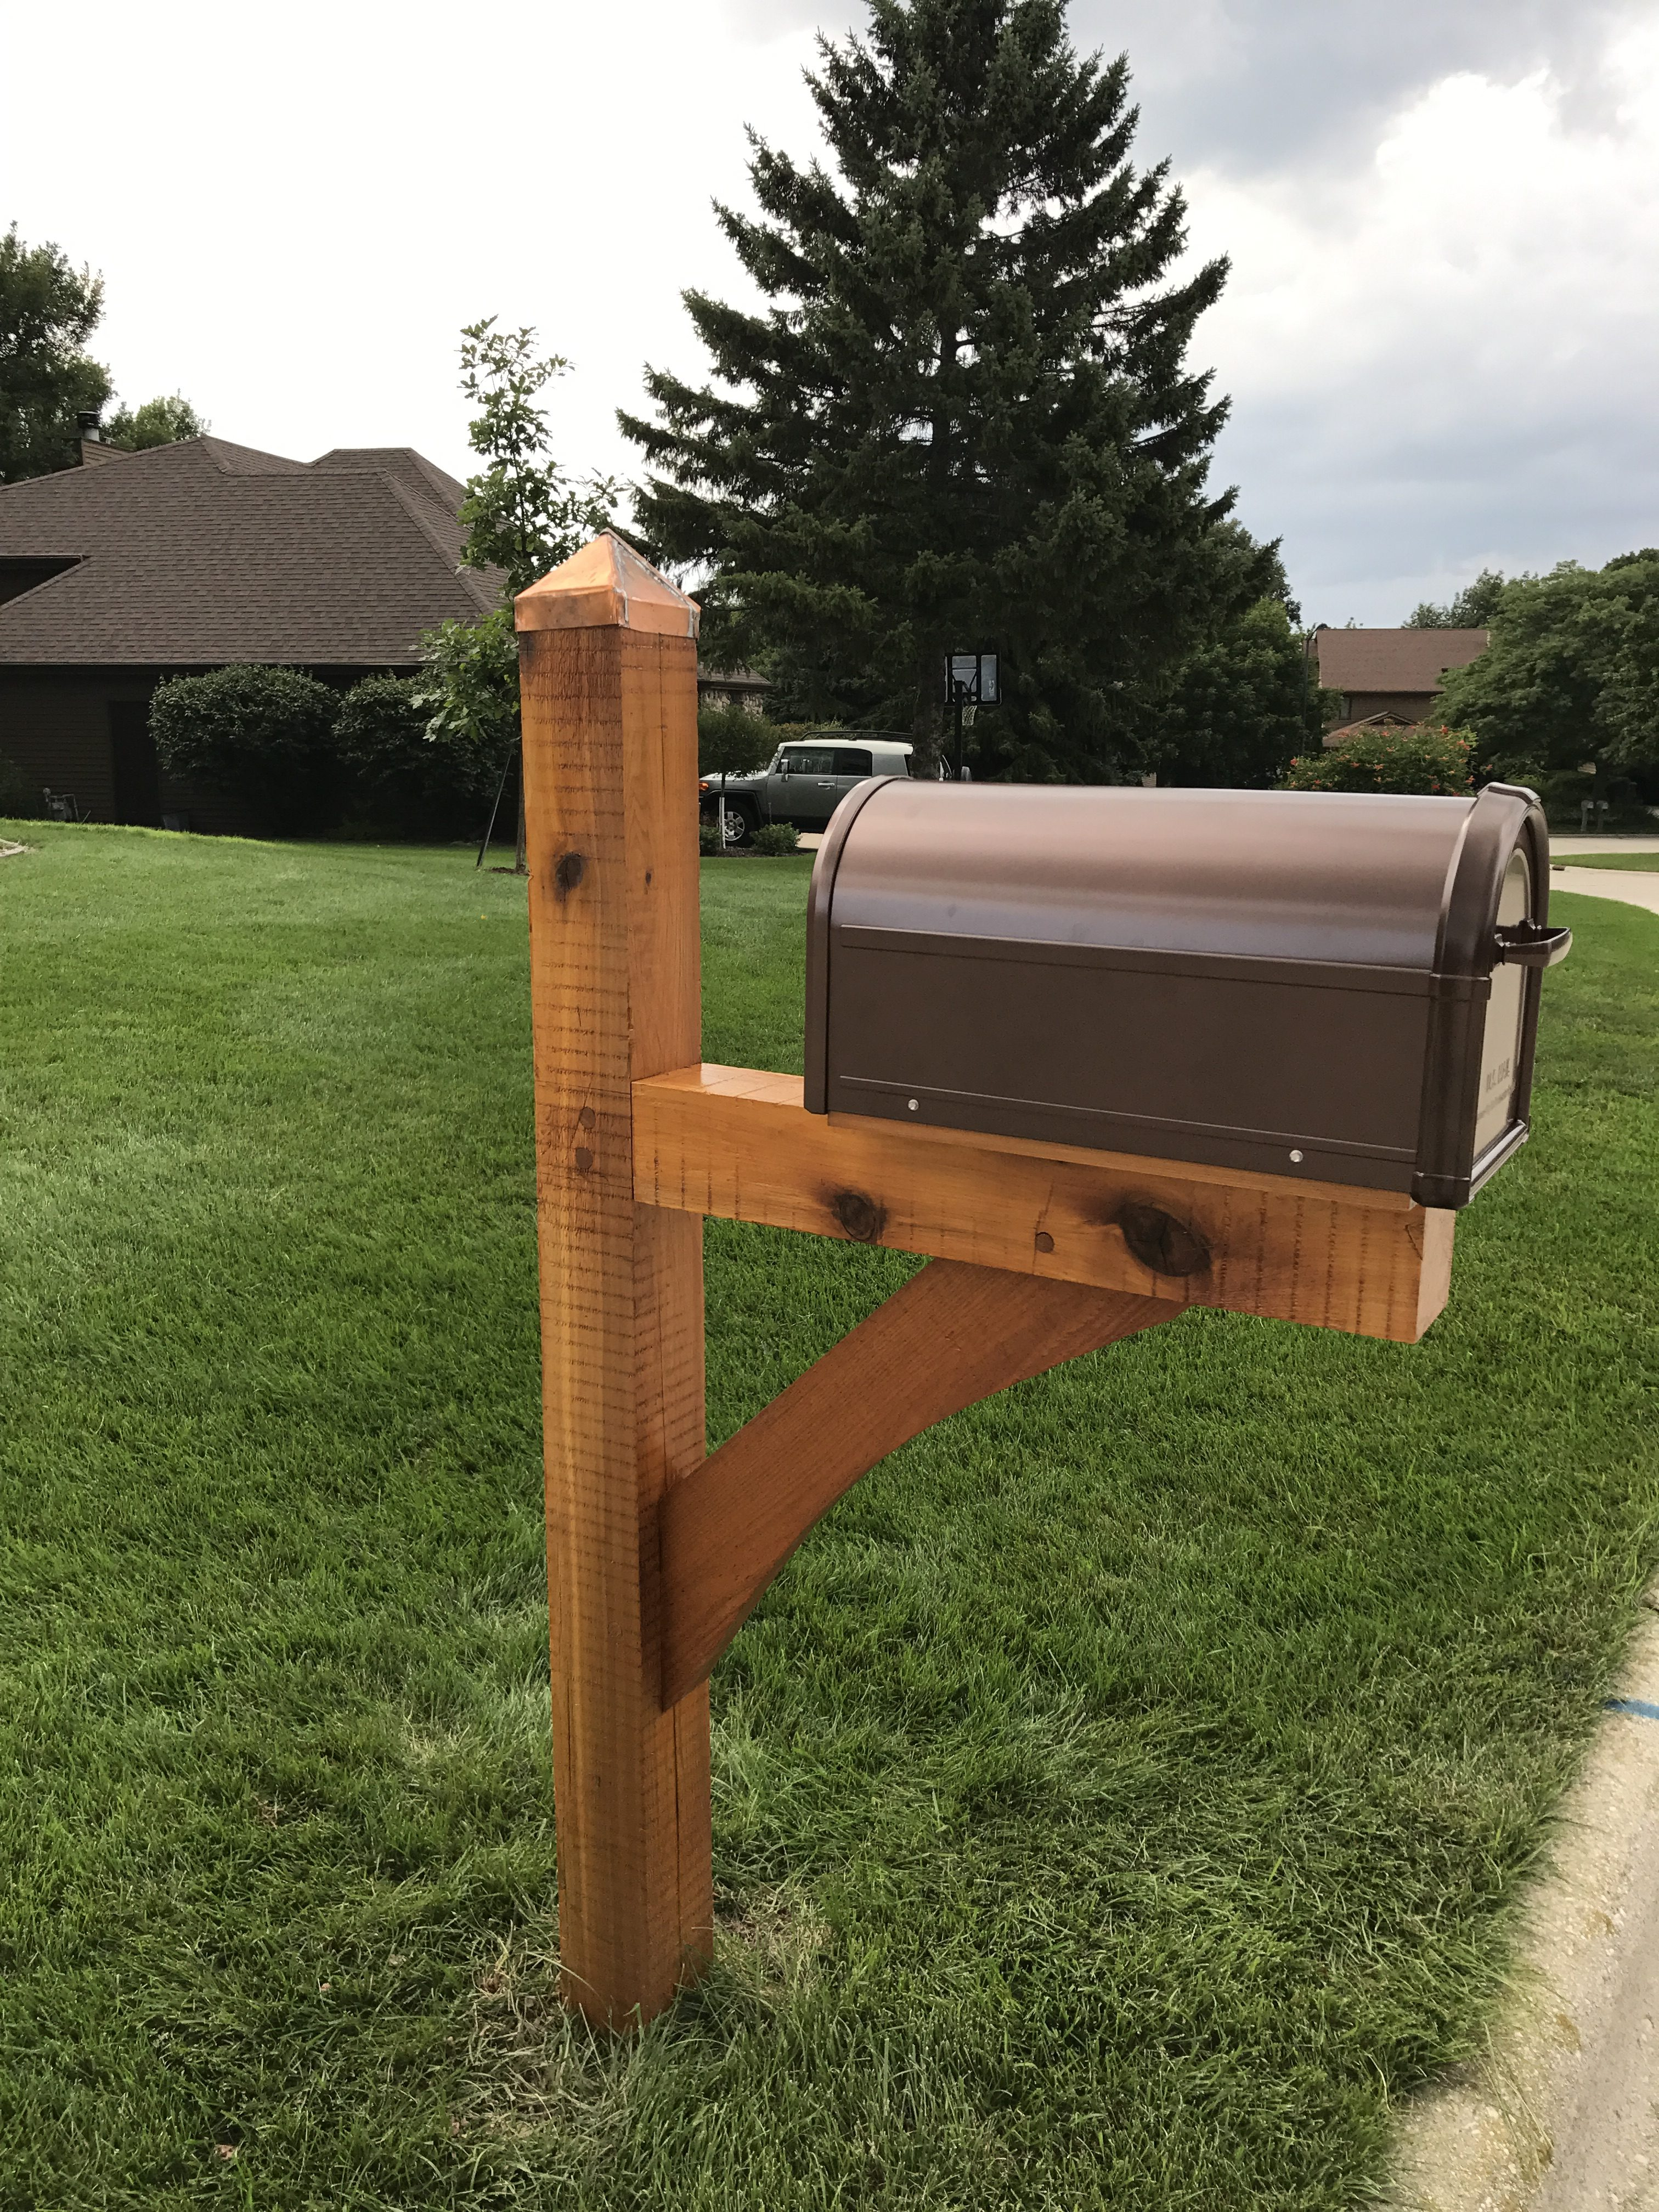 Mailbox by Michael Cieslewicz